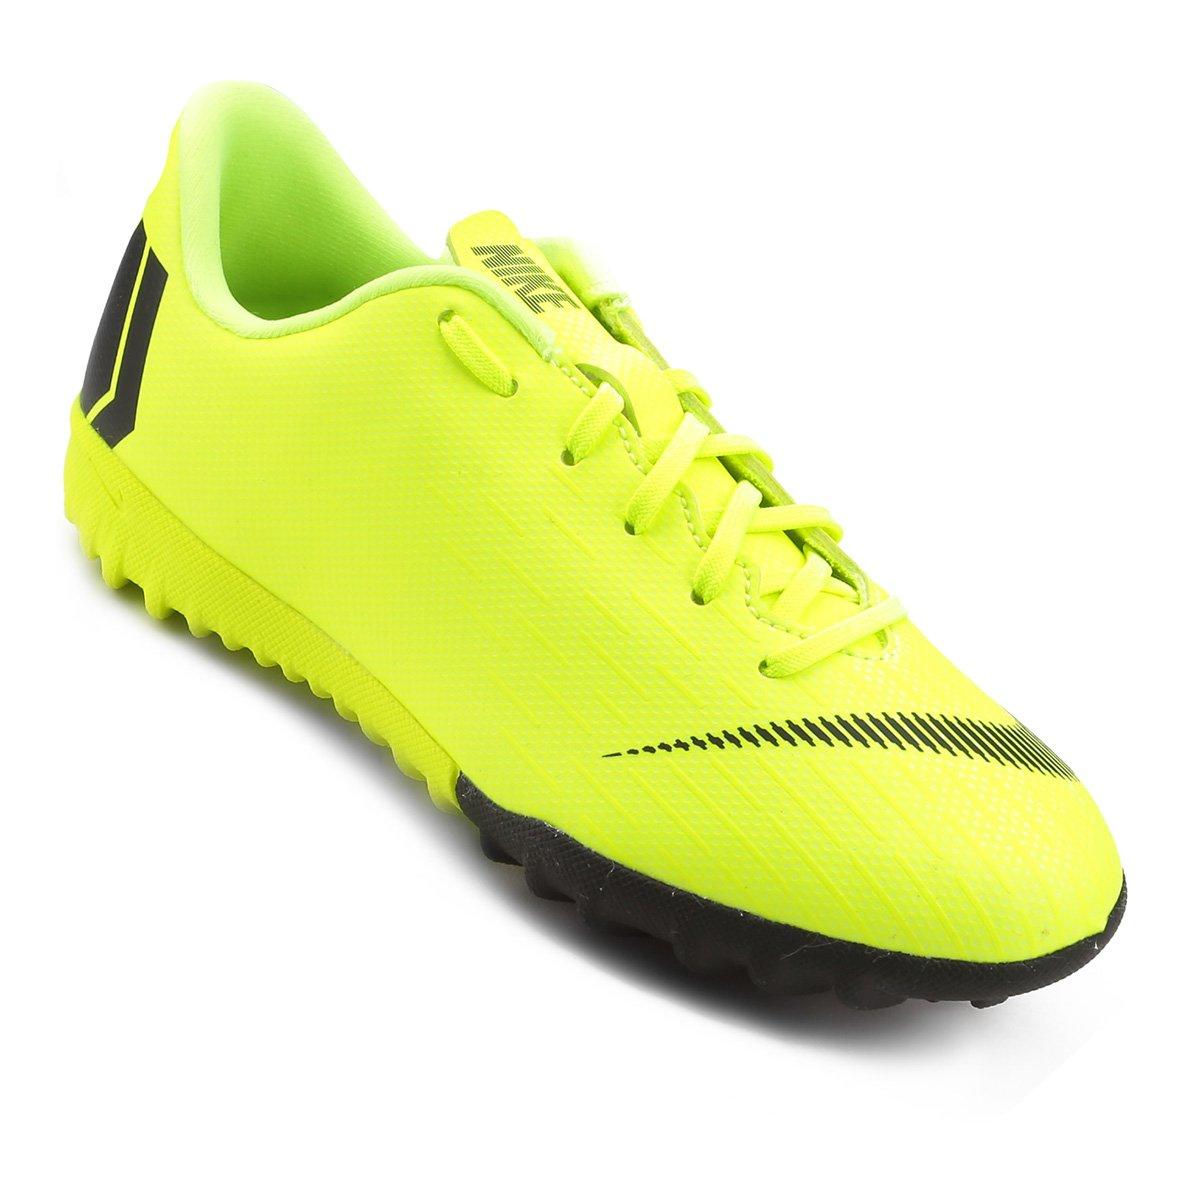 21ed76bb15359 Chuteira Society Infantil Nike Mercurial Vapor 12 Academy GS TF - Amarelo e  Preto | Netshoes